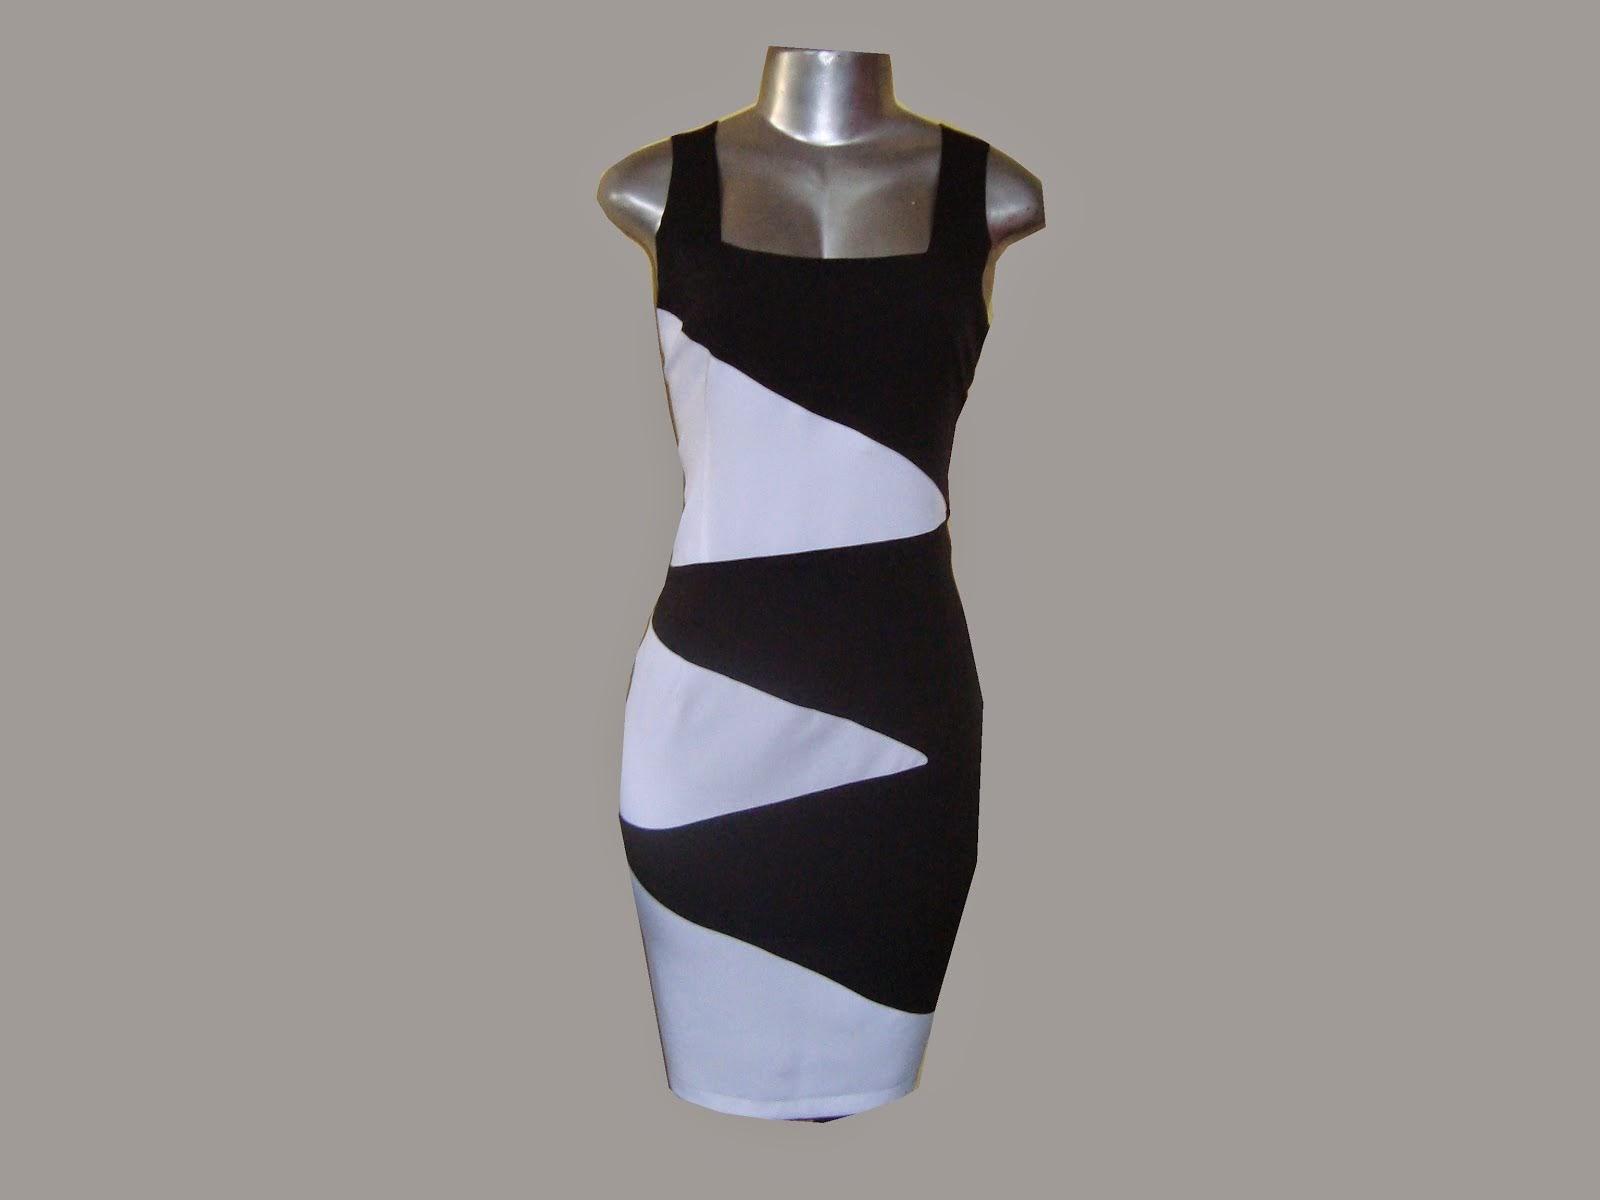 vestido preto e branco de prada